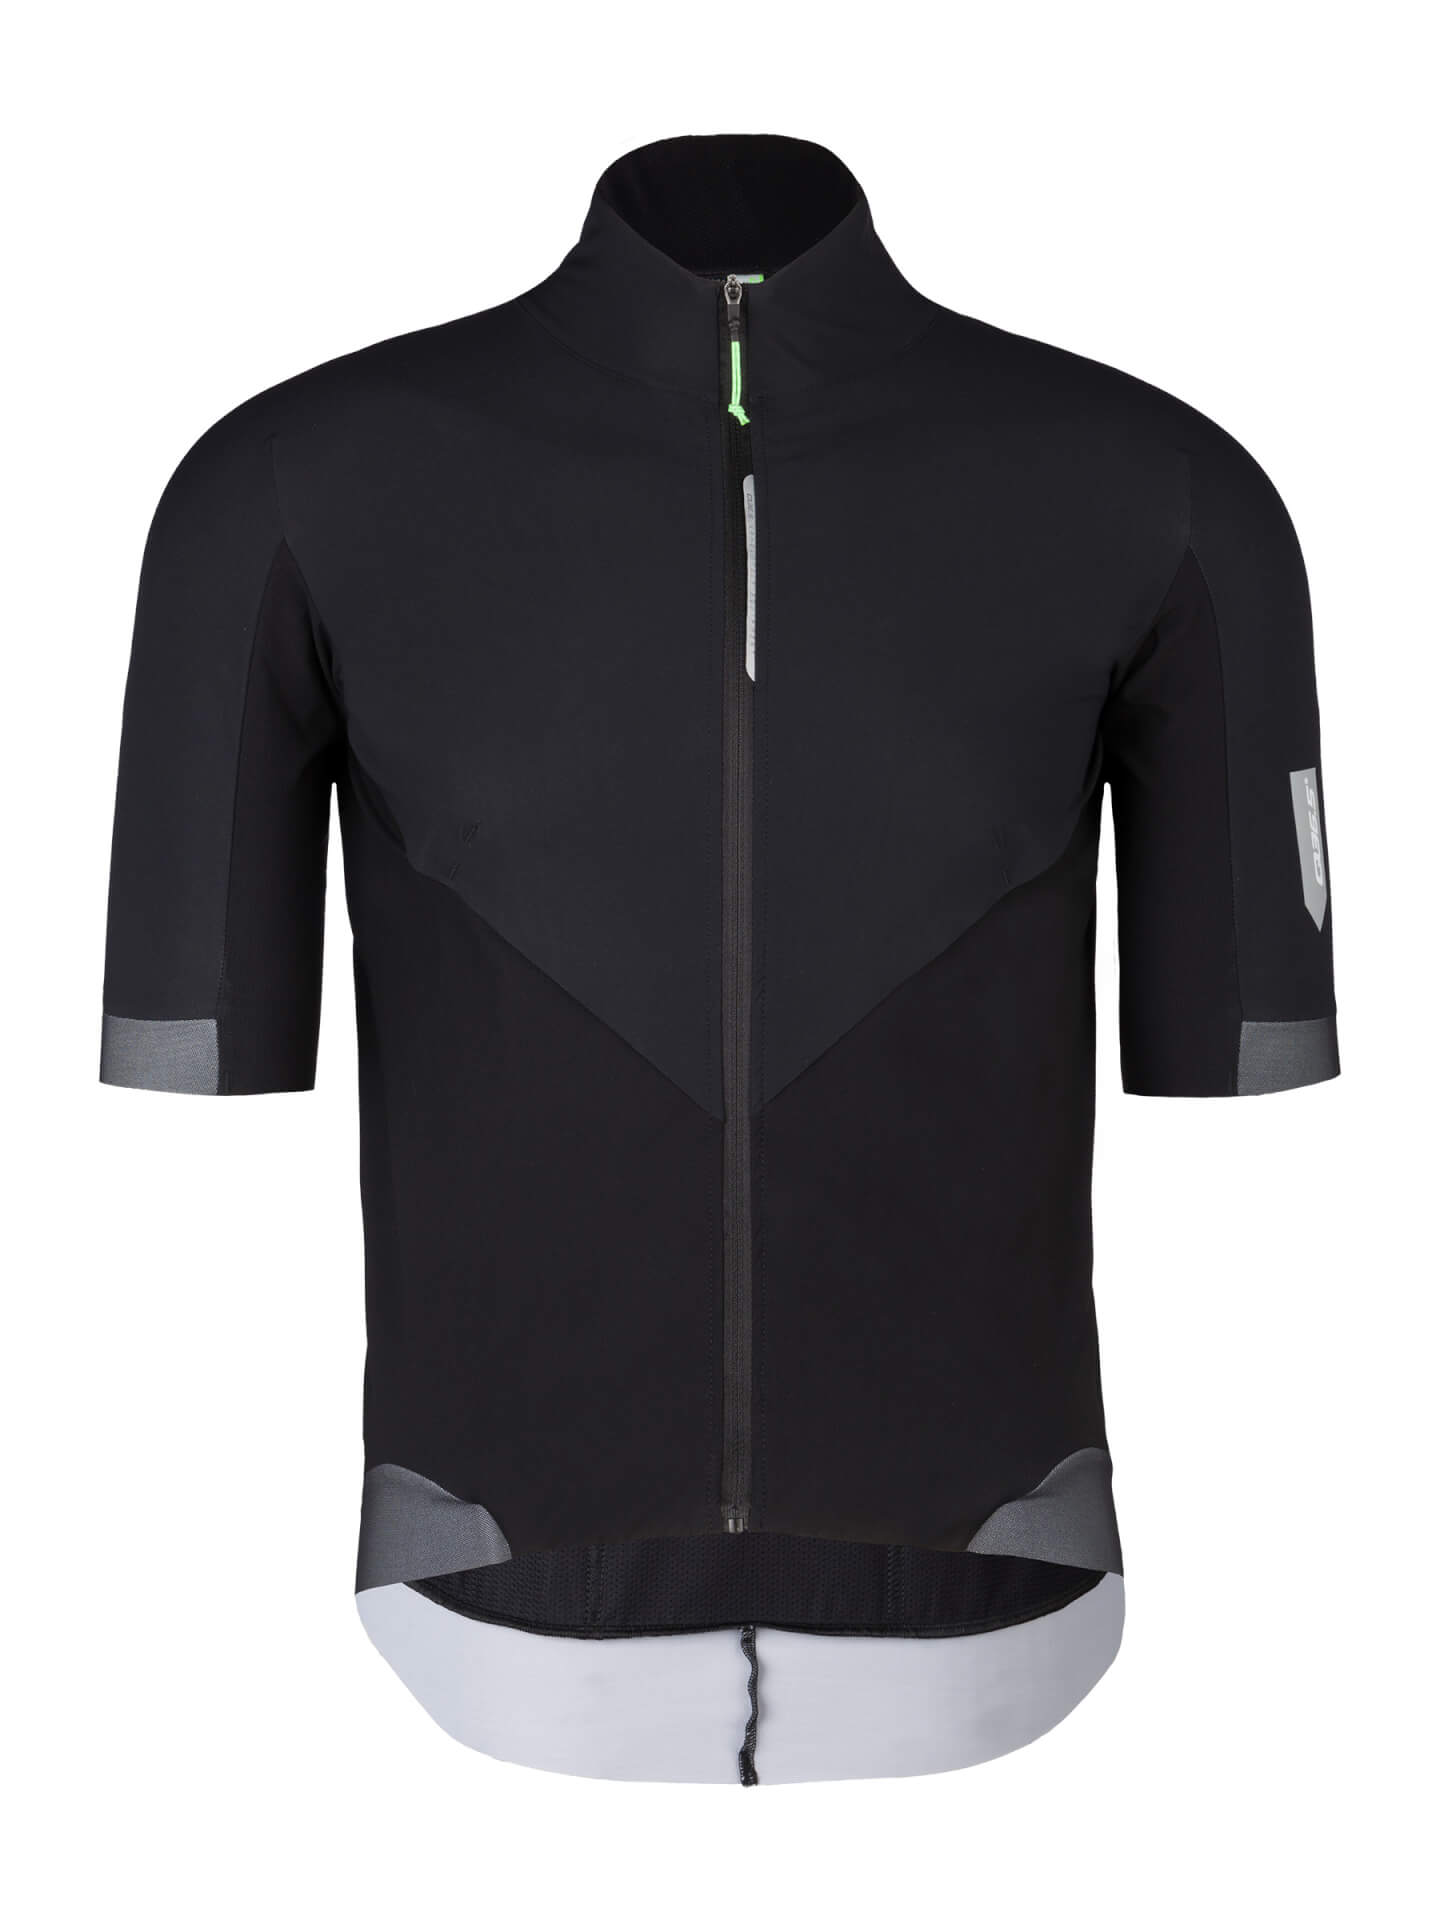 Cycling rain jacket Bat Shell Q36.5 new 2021